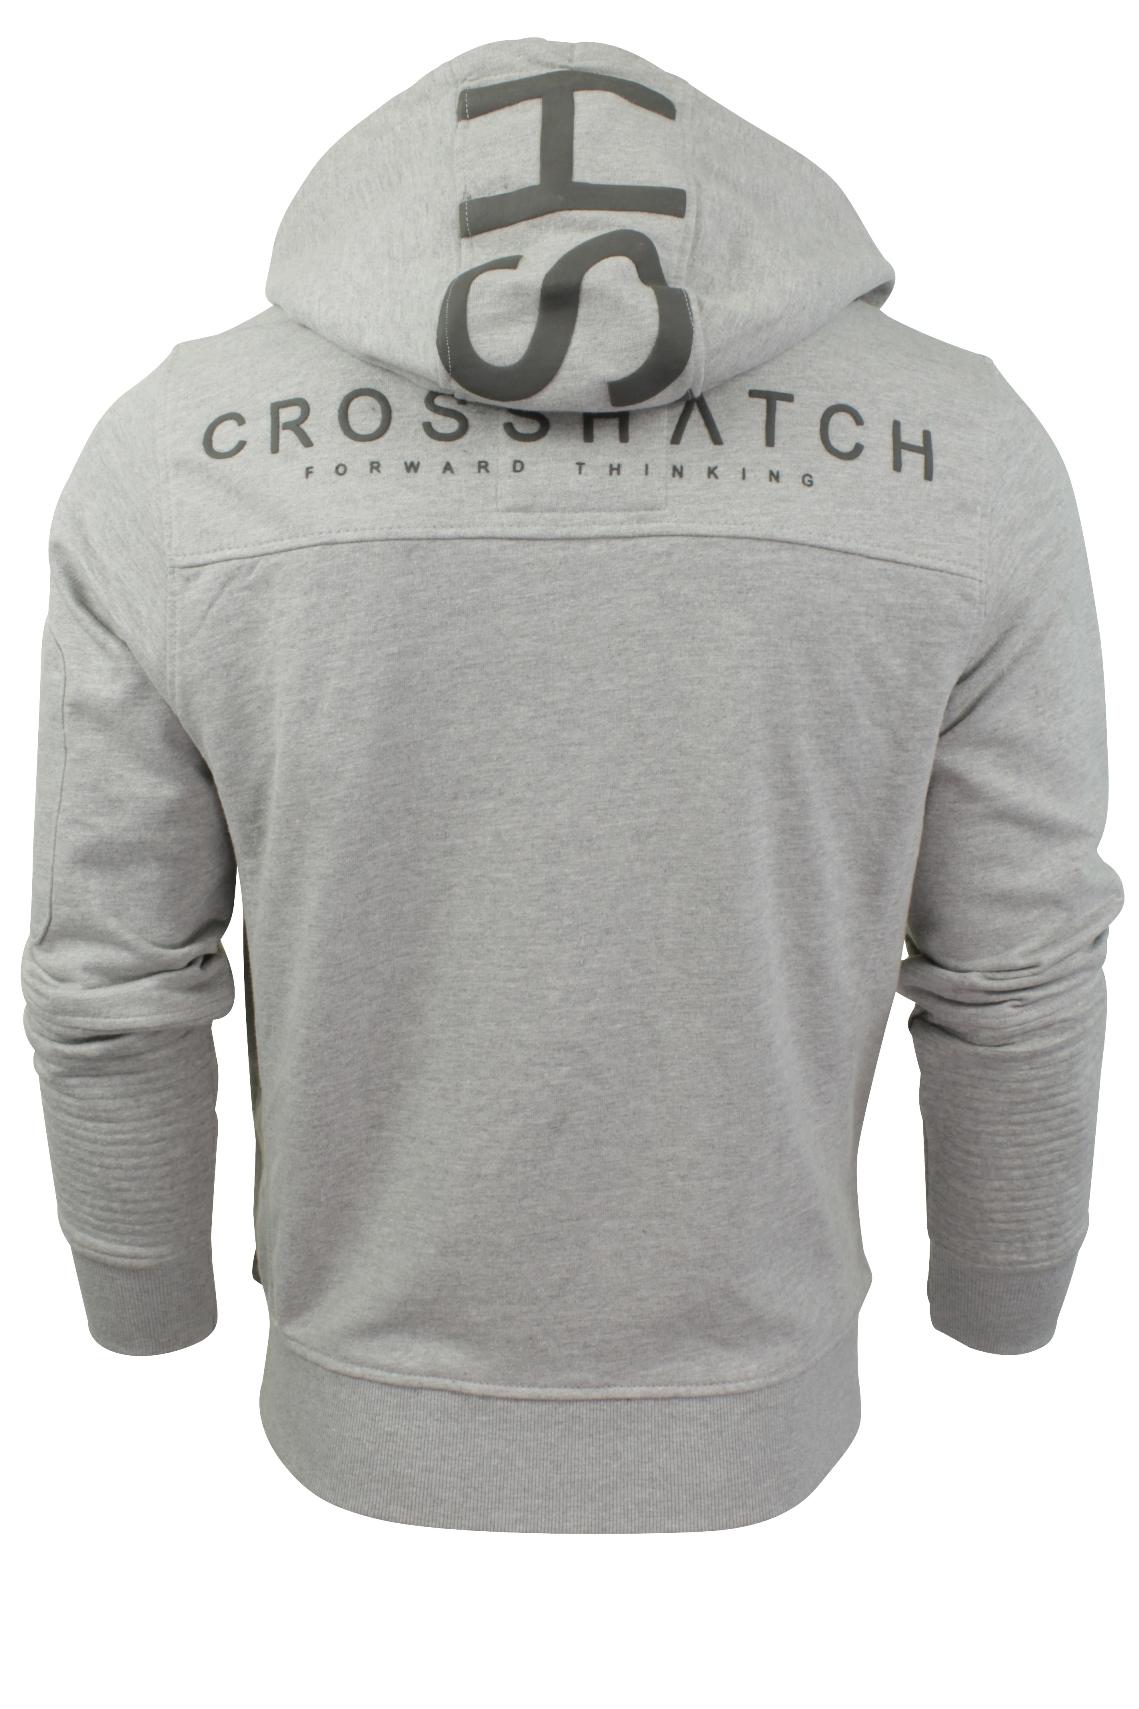 Mens-Hoodie-Jumper-by-Crosshatch-039-Goby-039-Long-Sleeved